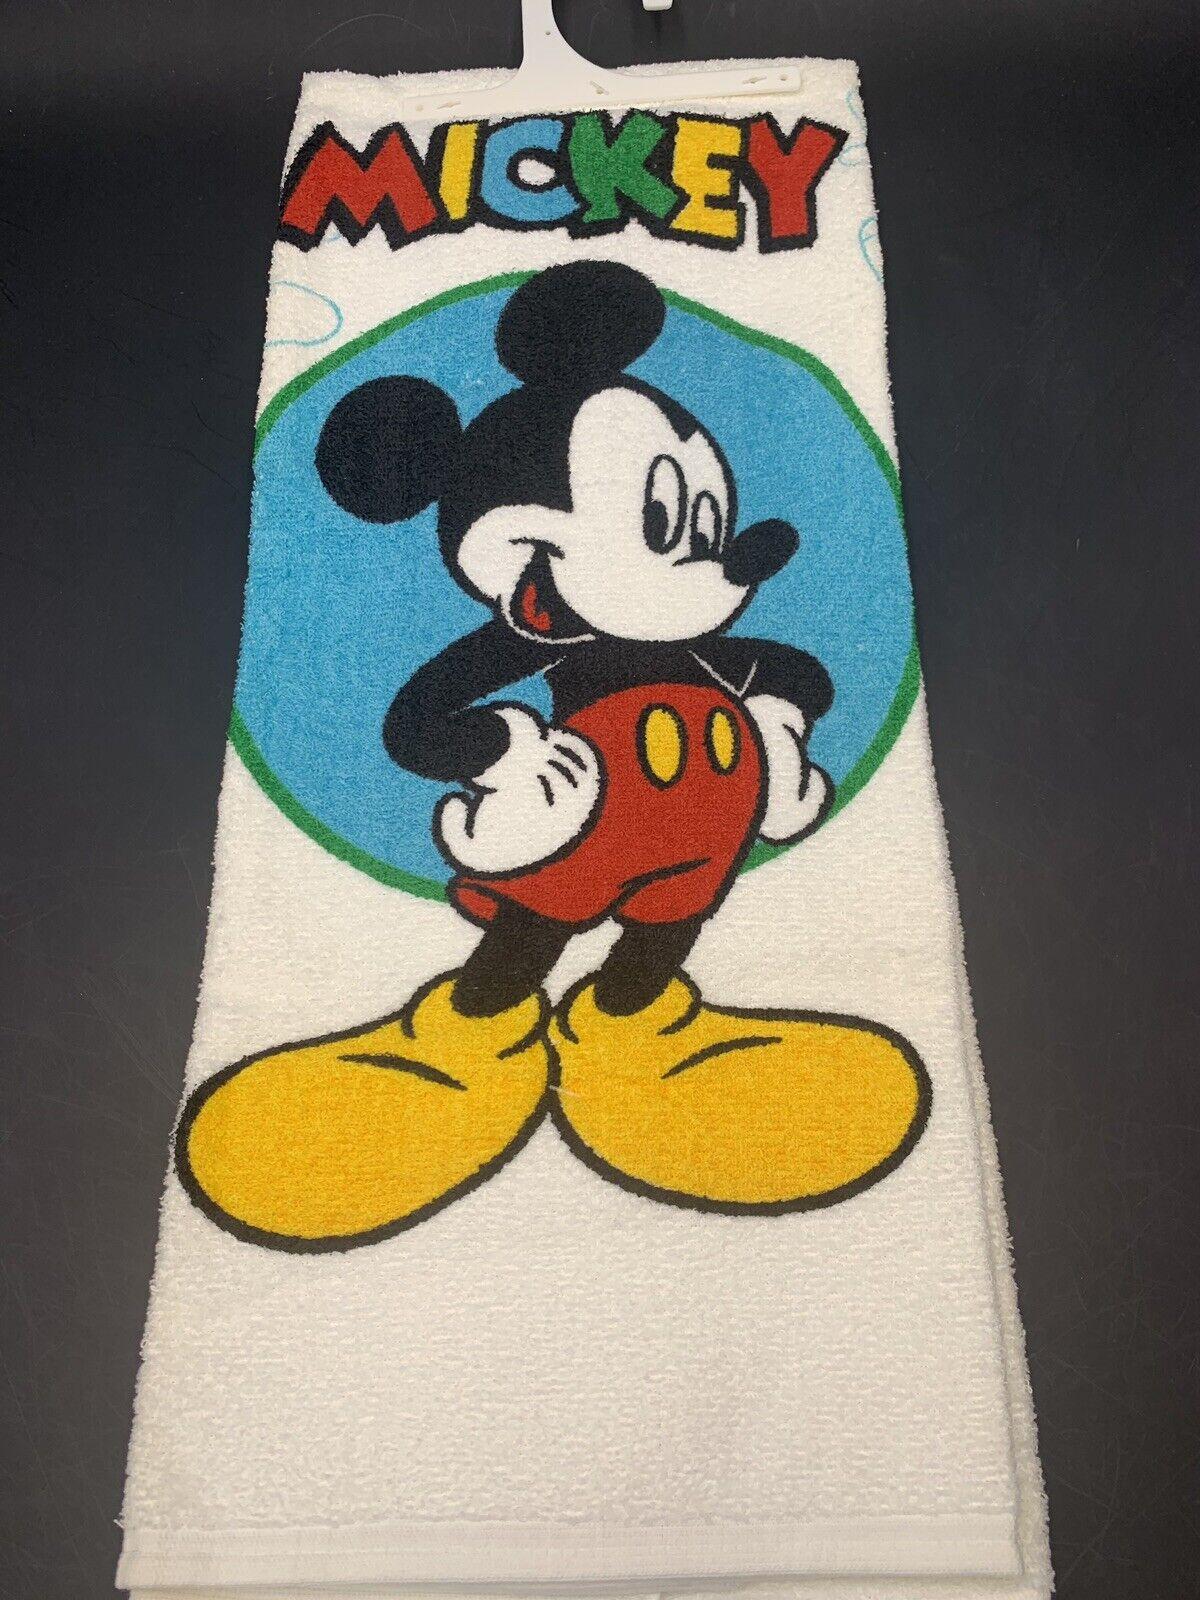 White Disney Vintage Minnie /& Mickey Mouse Cotton Beach Bath Towel Quick Dry Ultra Soft Large Size 70 x 140 cm